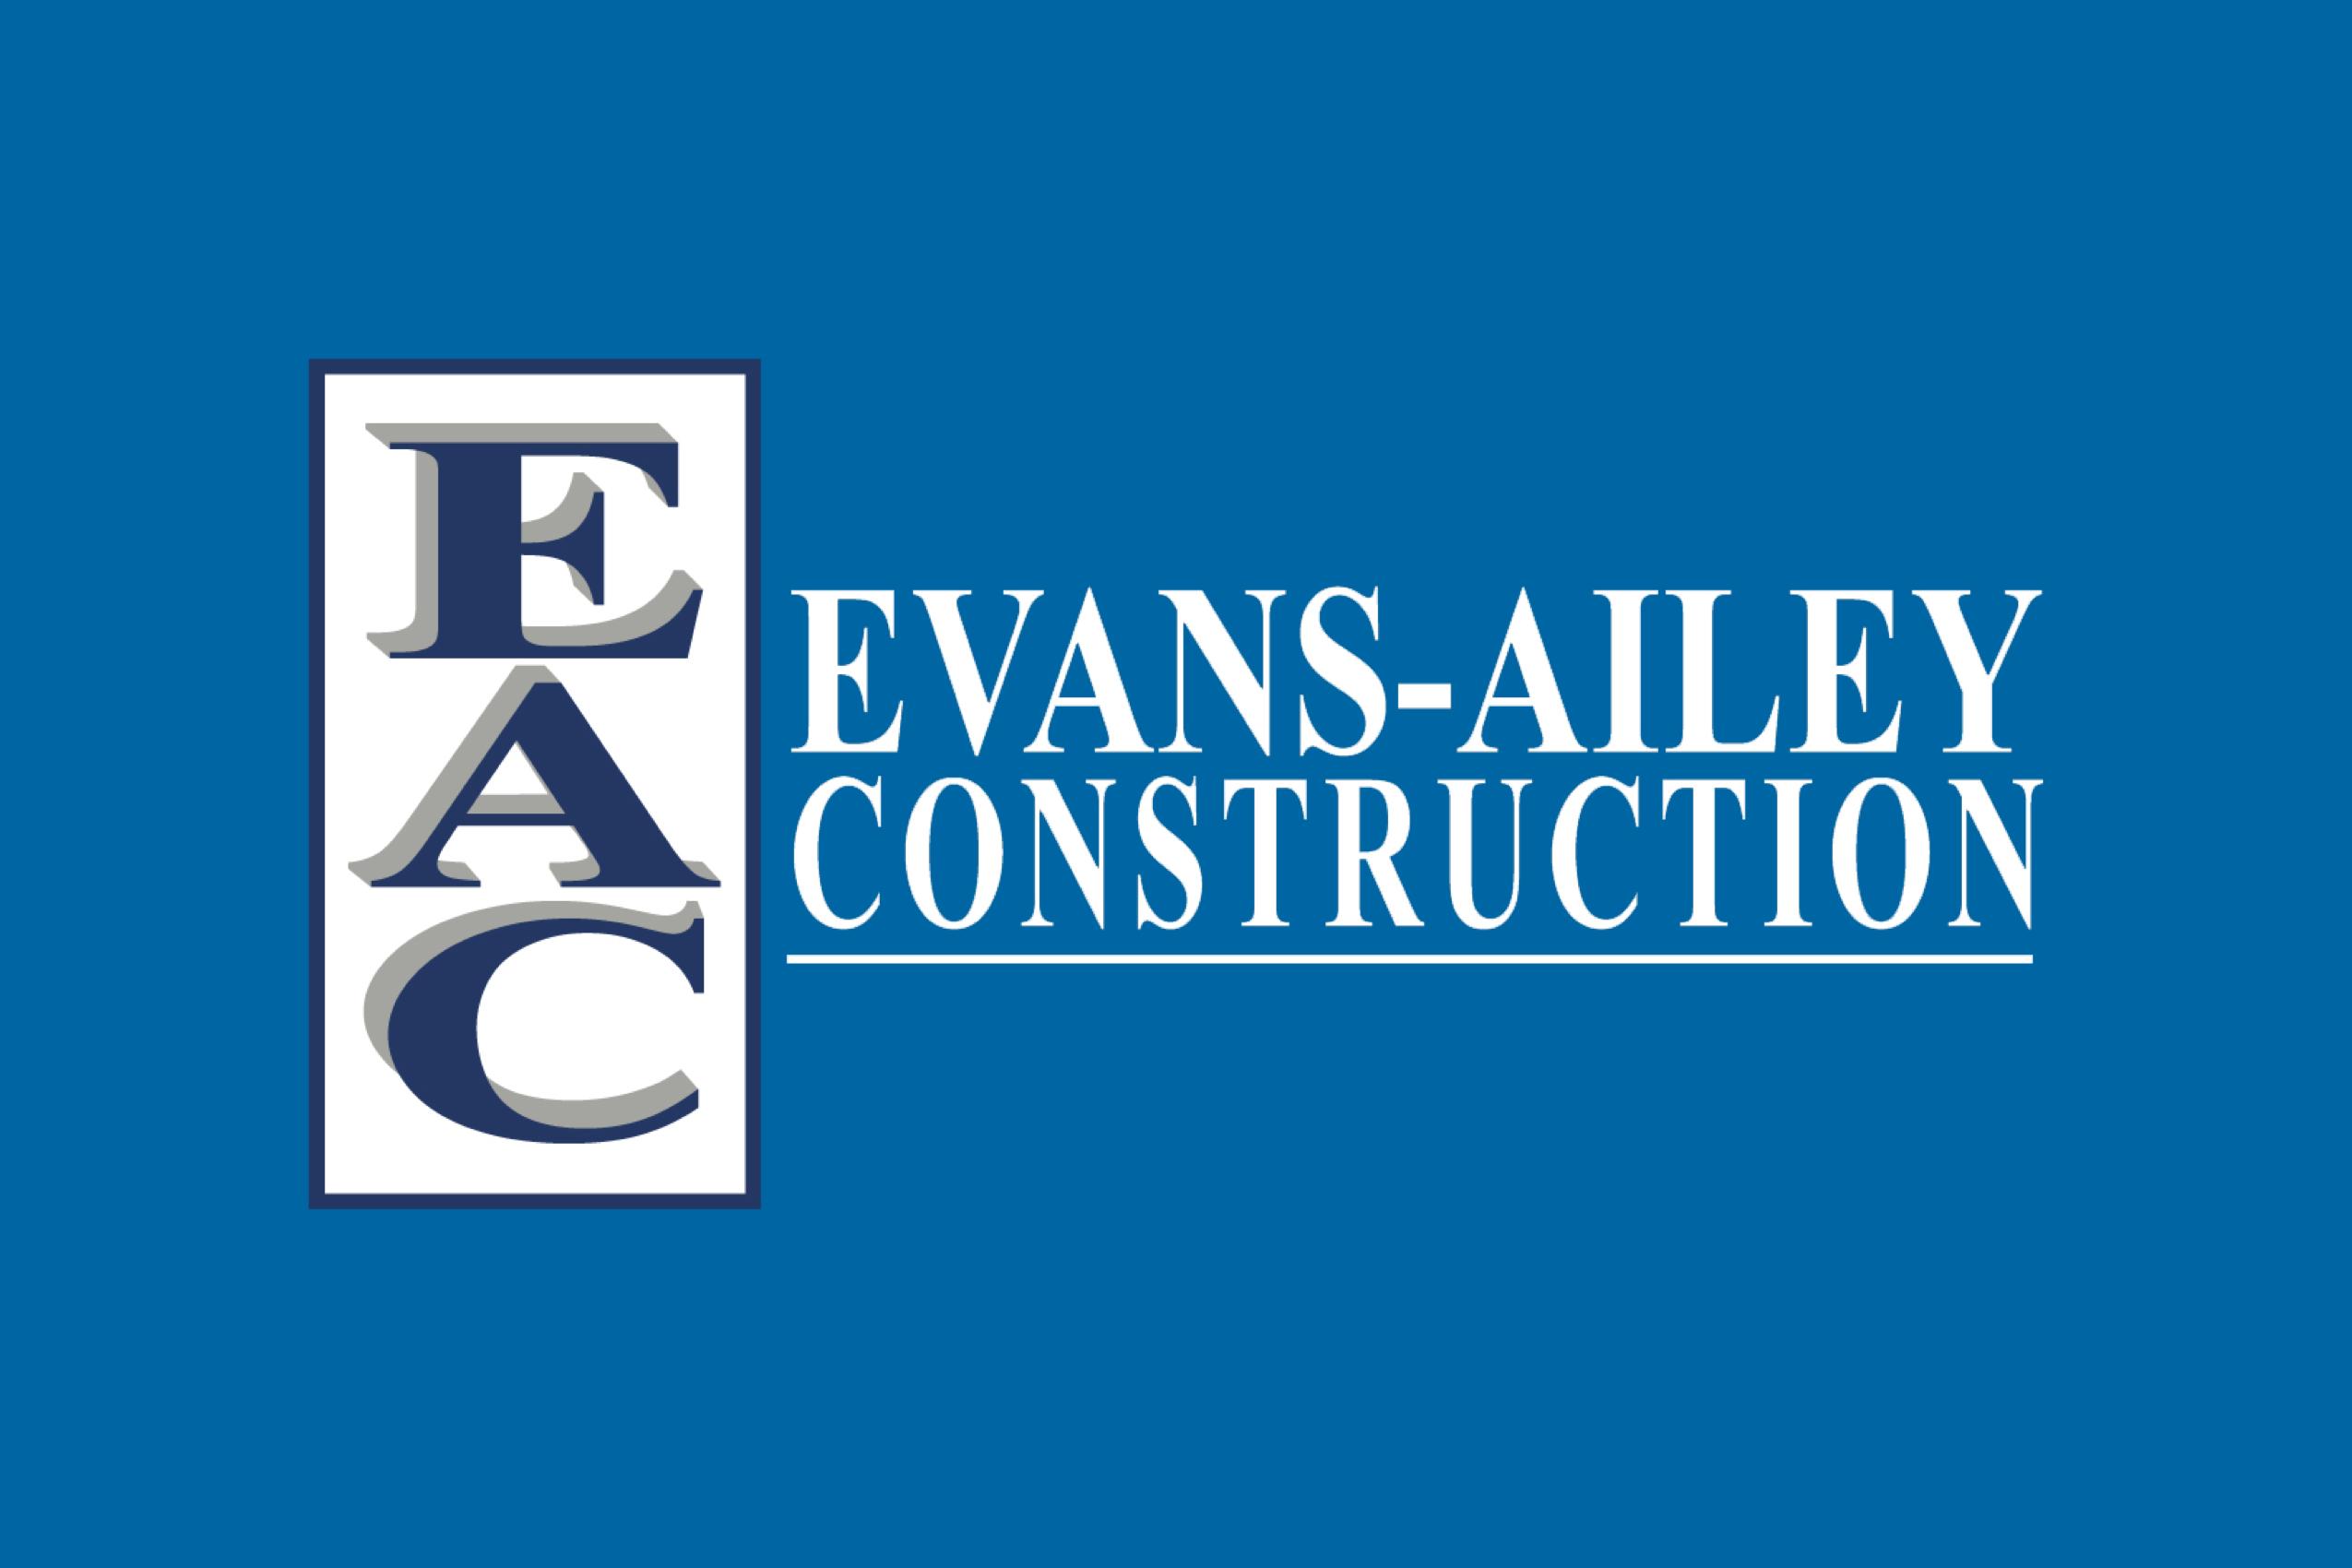 Evans - Ailey Construction